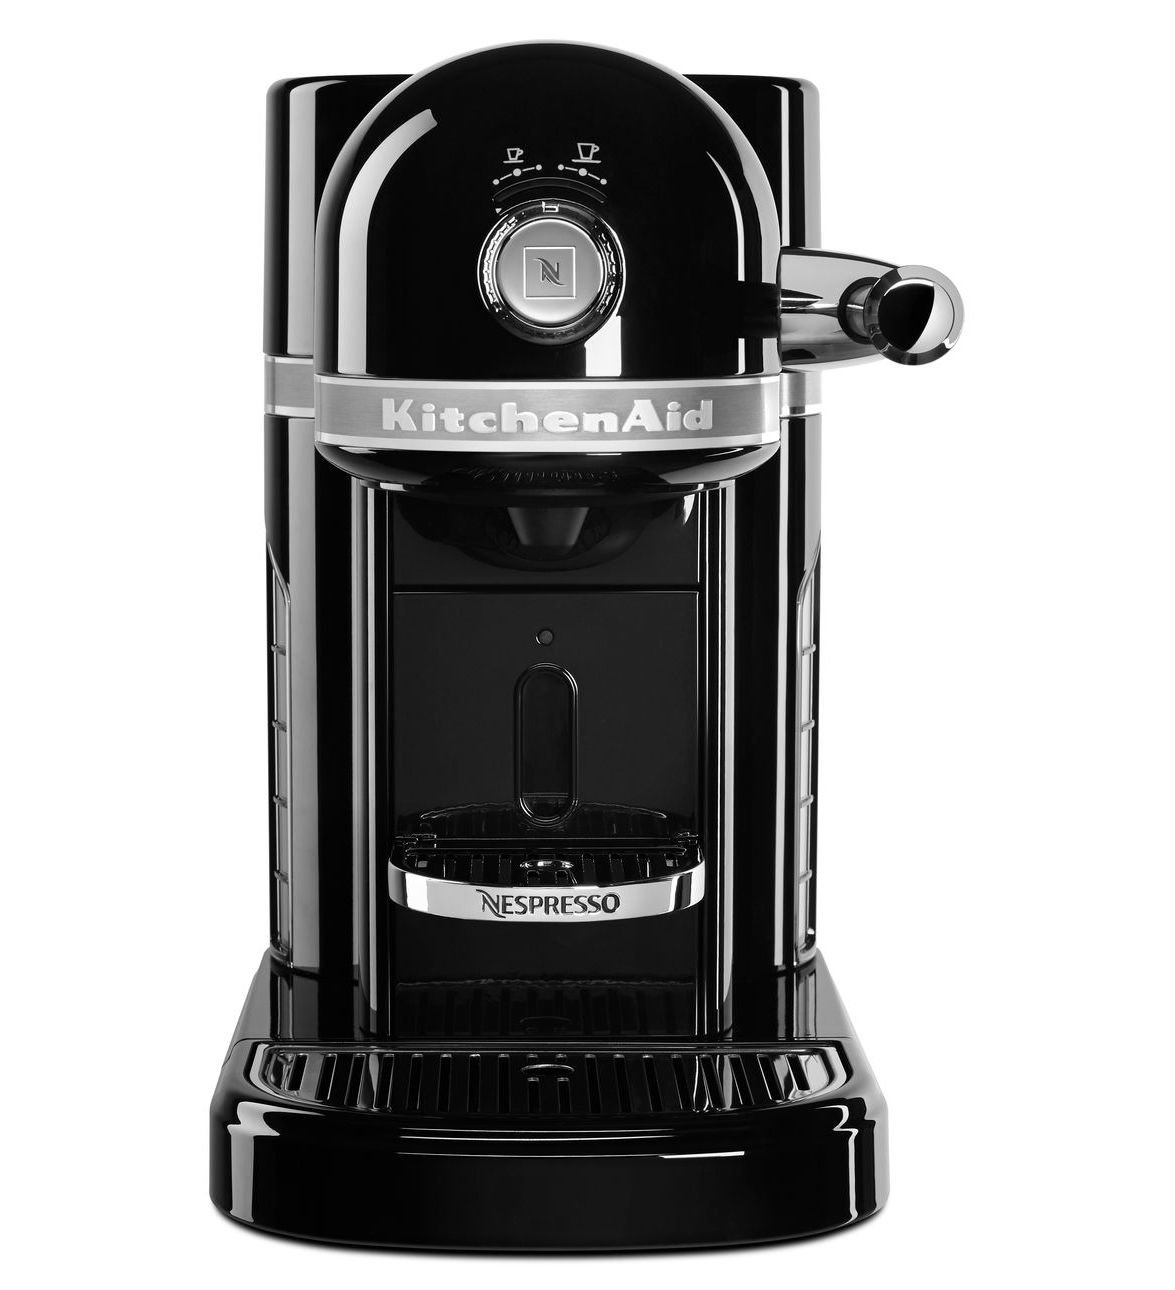 KitchenAid Artisan Nespresso Independiente Semi-automática Máquina ...